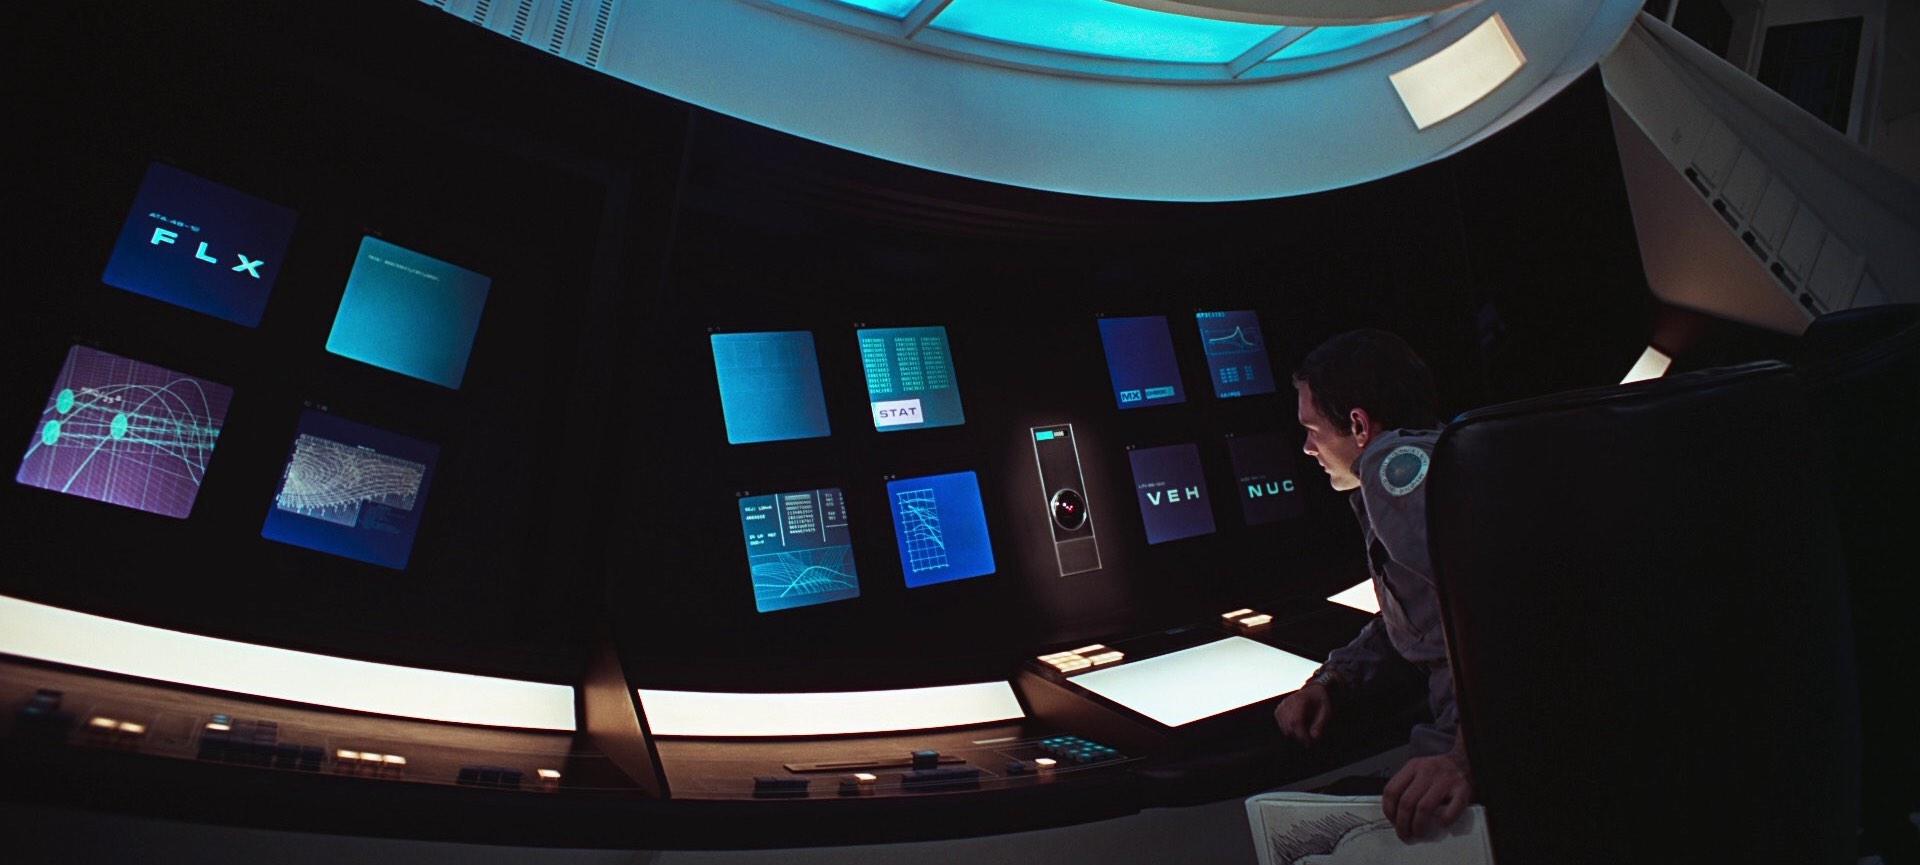 2001: A Space Odyssey - 4K UHD